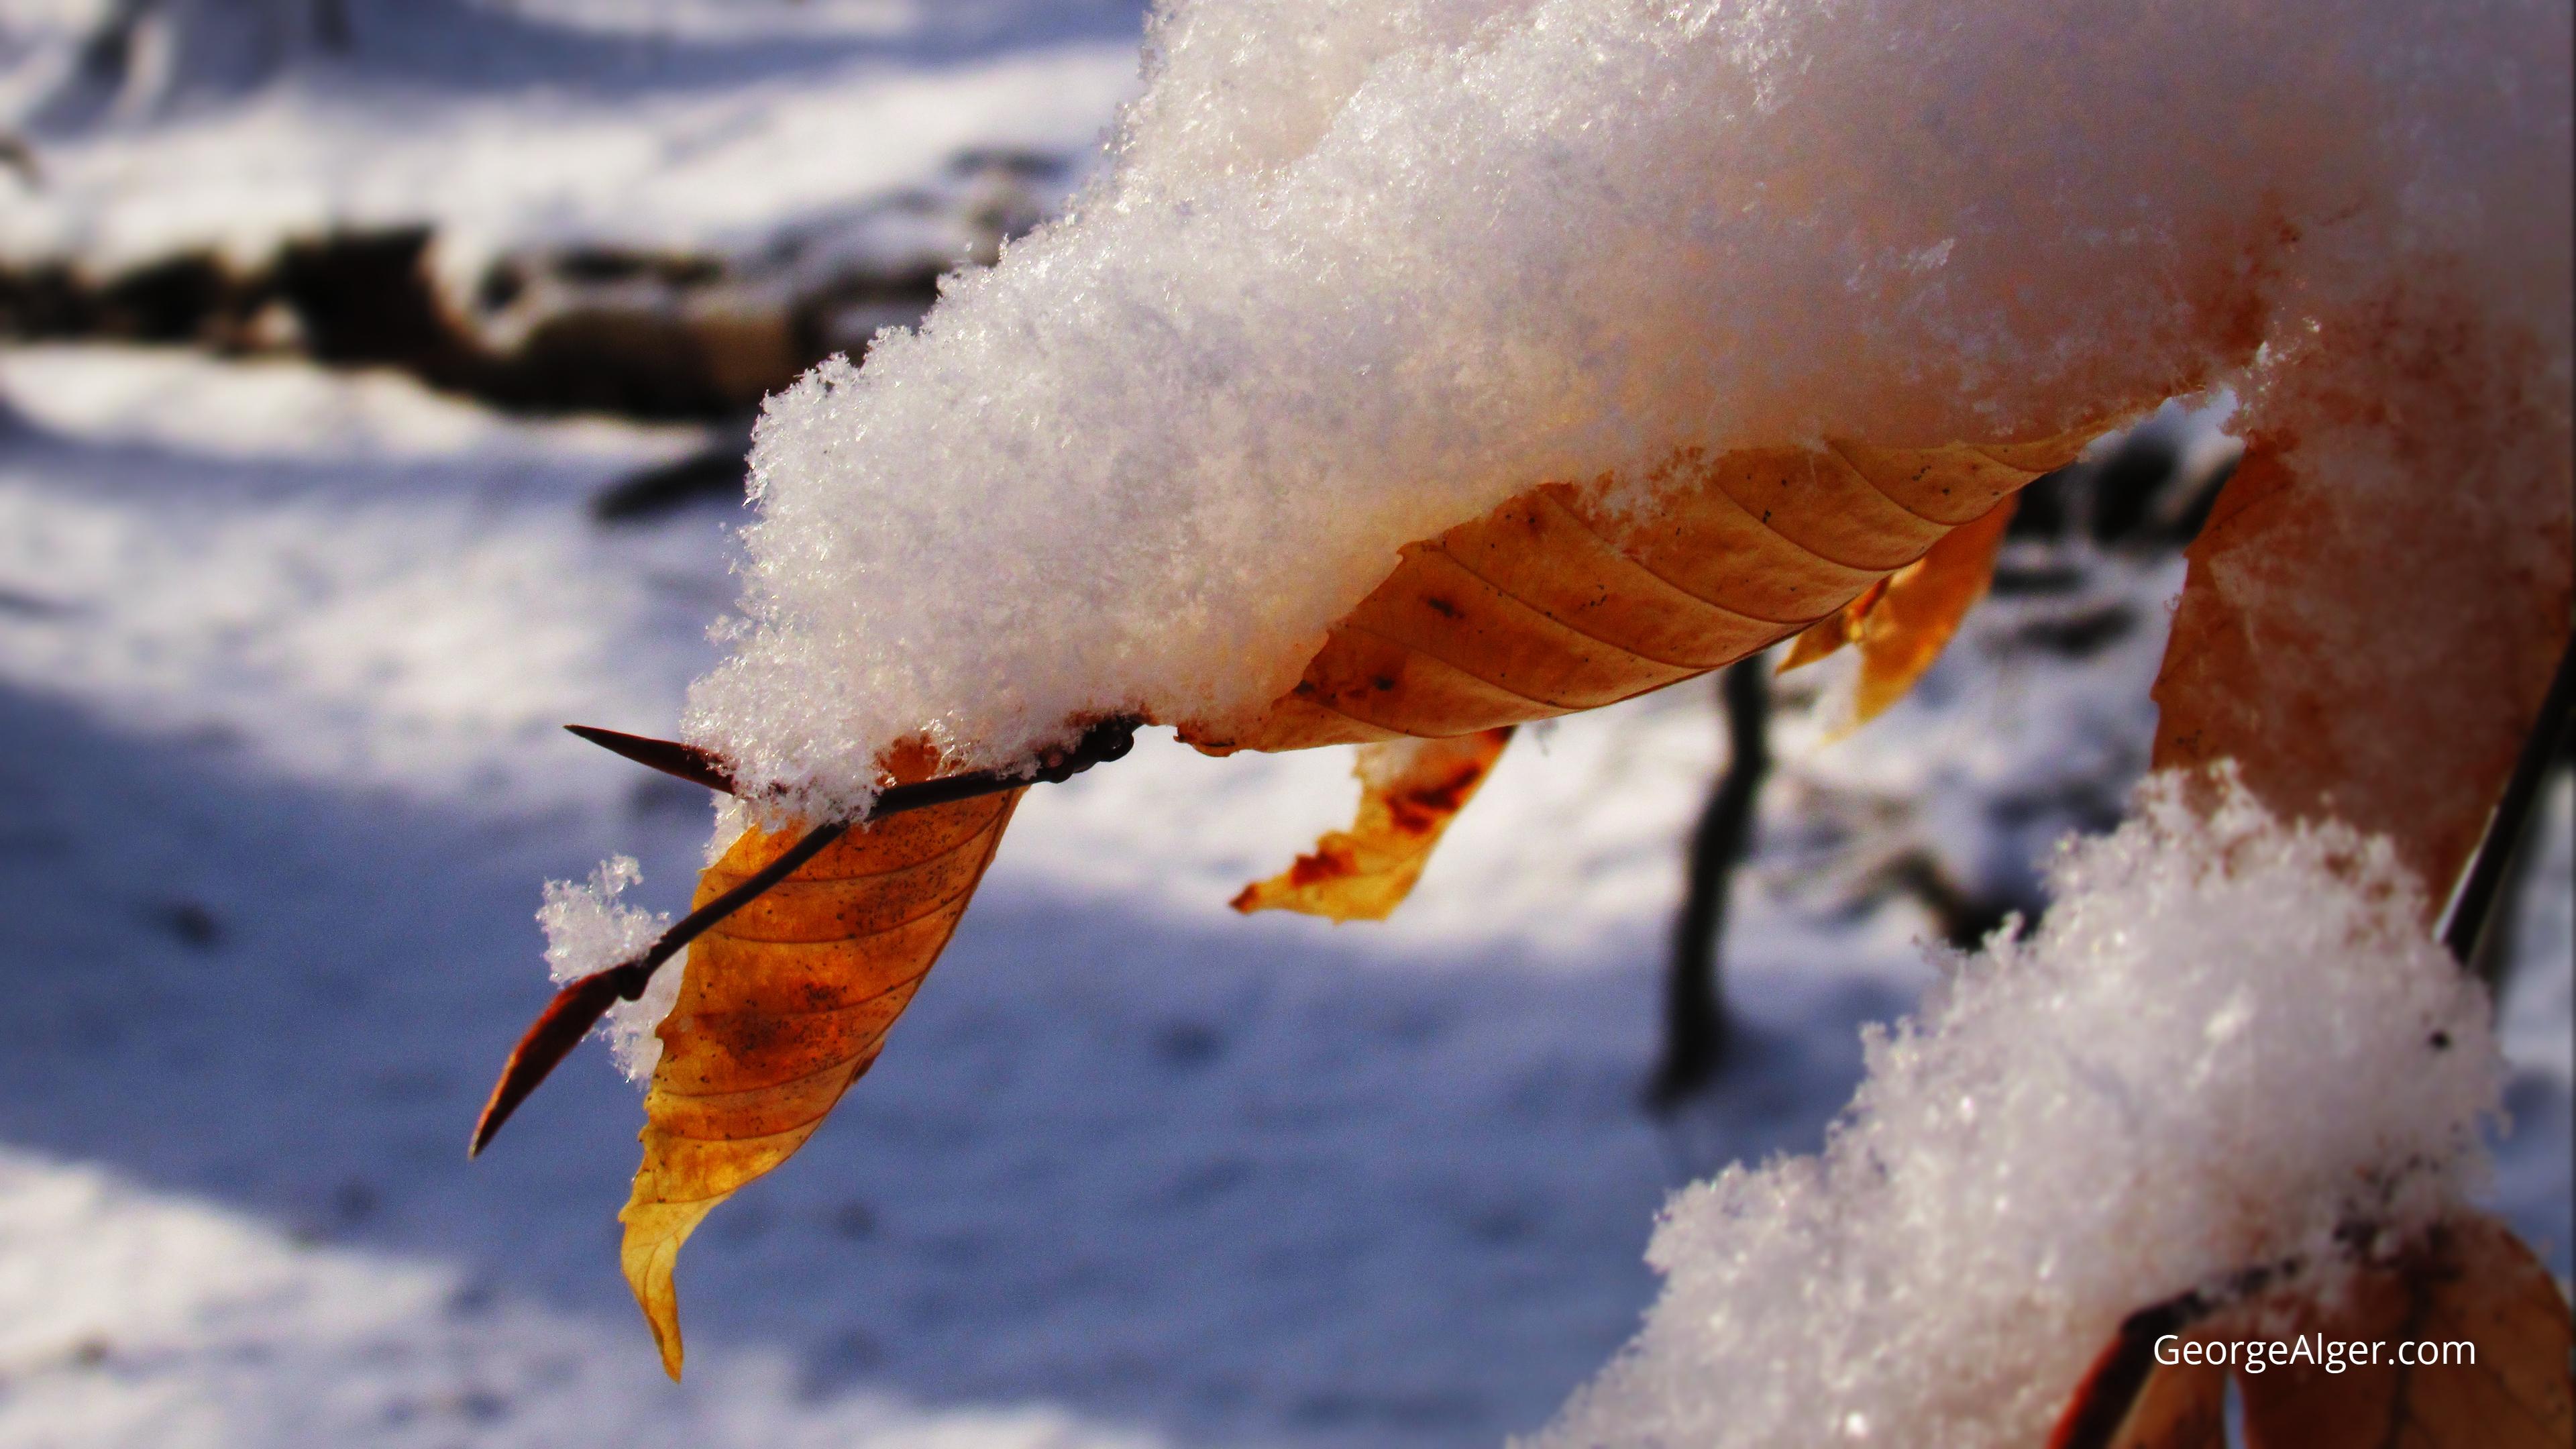 American Beech Snow